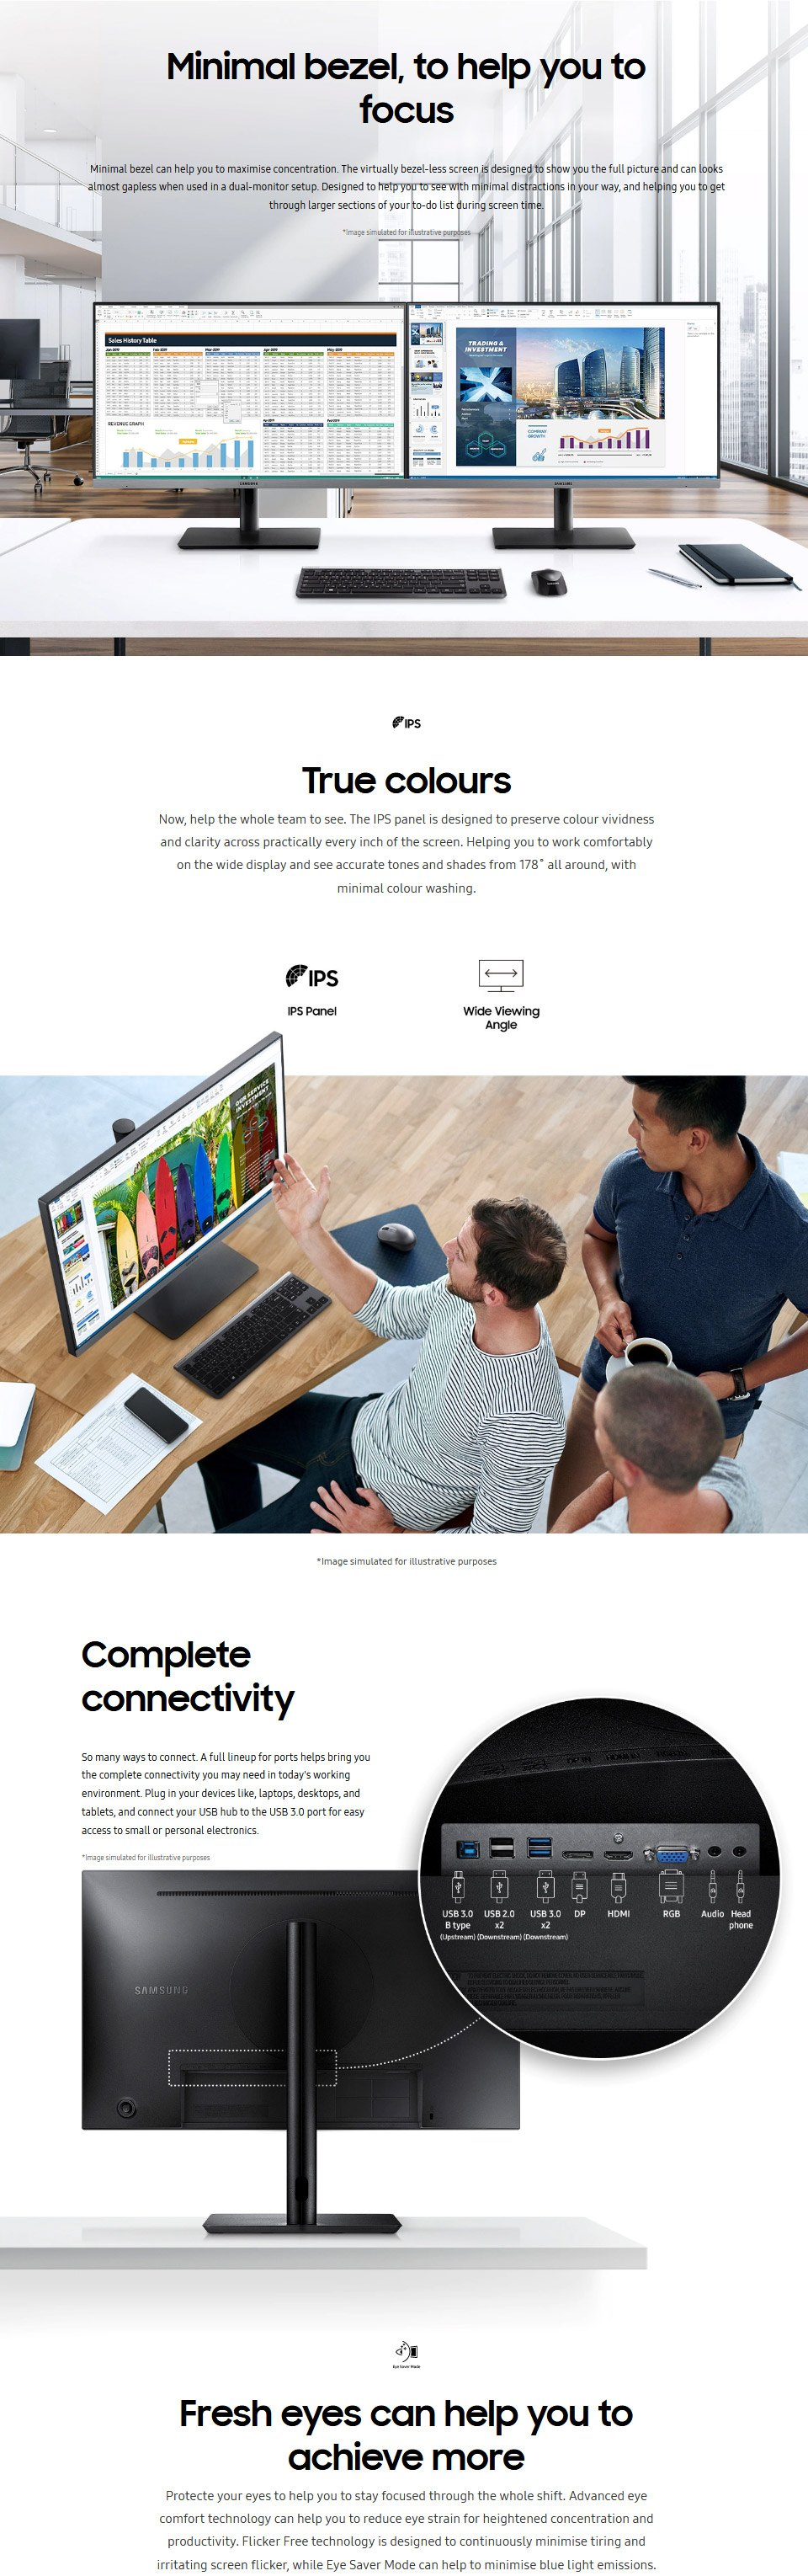 Samsung R650 FHD 75Hz IPS 24in Monitor features